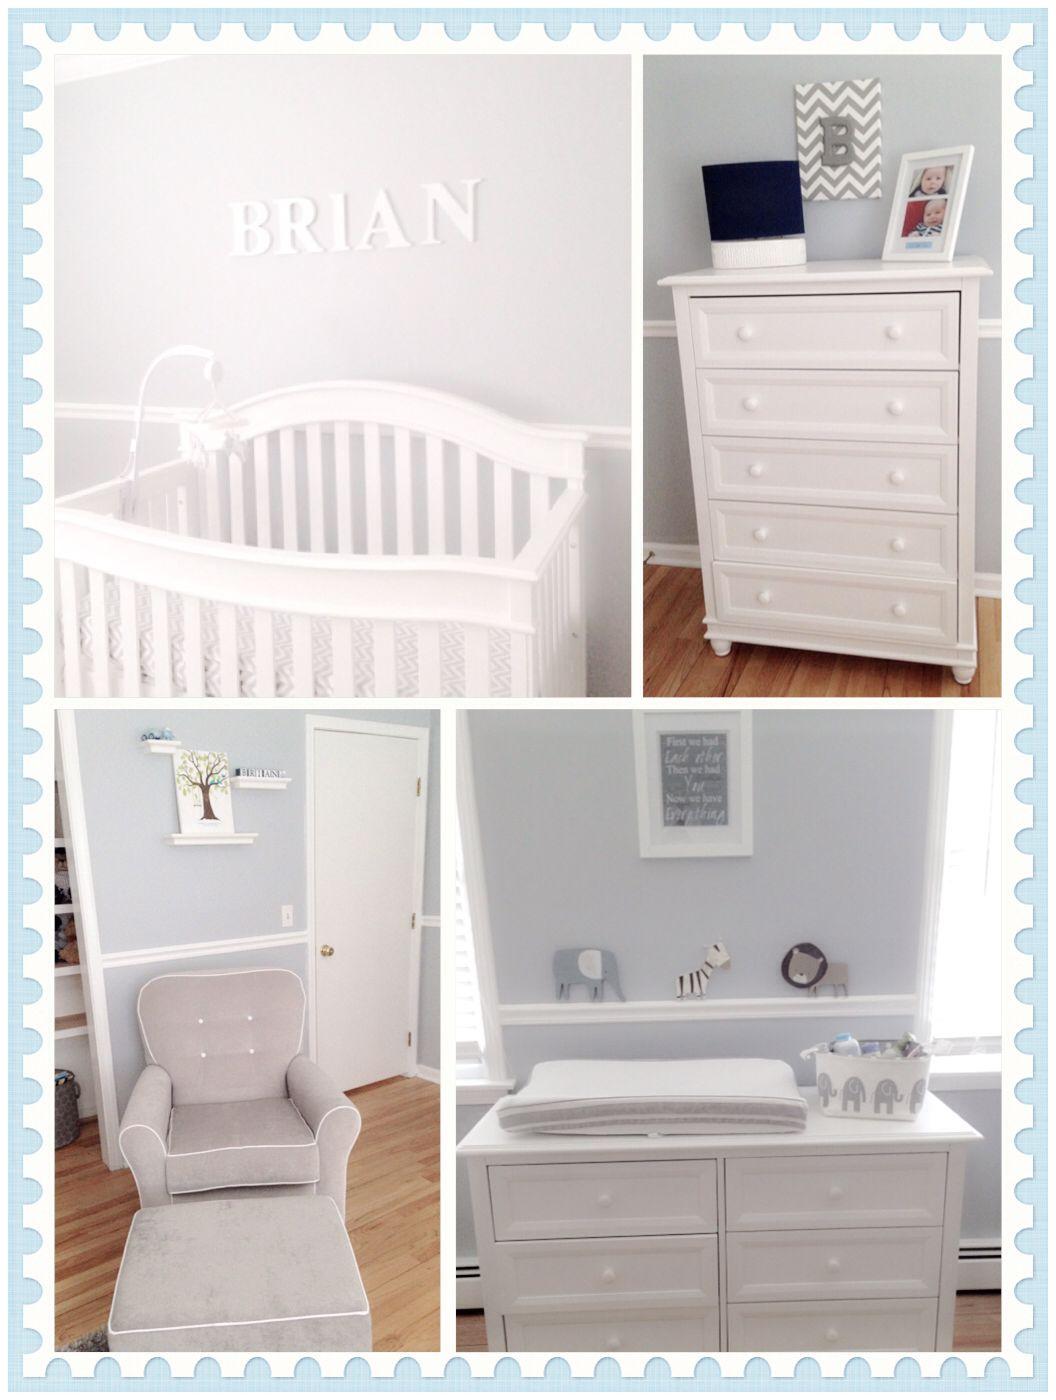 Baby Boy Room Paint Ideas: Baby Boy Nursery Room Using Half Silver Dollar Benjamin